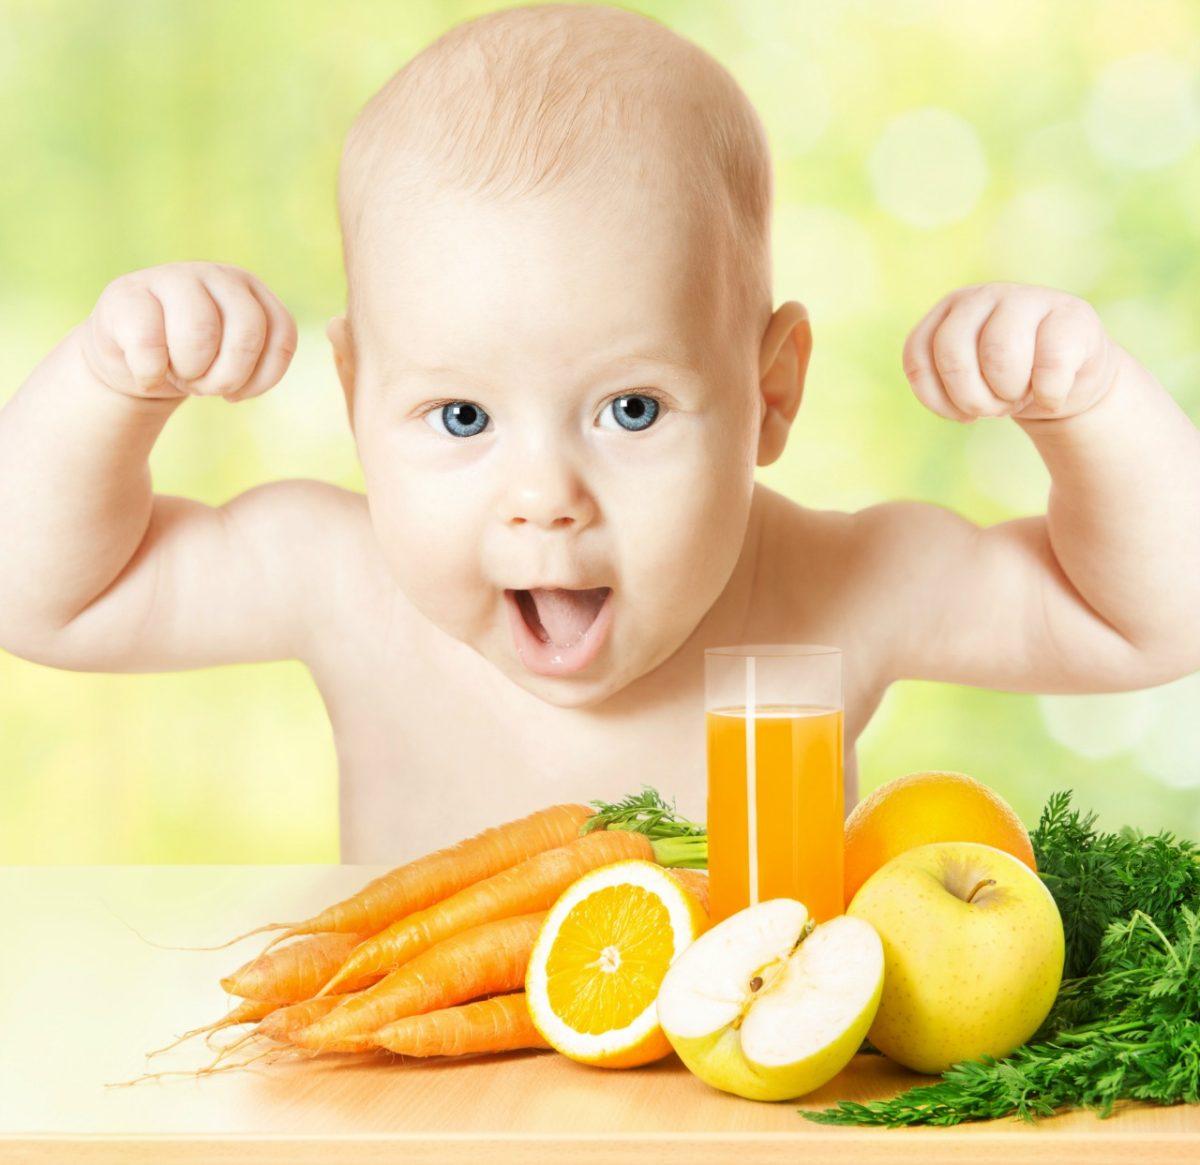 Raising a Healthy Baby Naturally